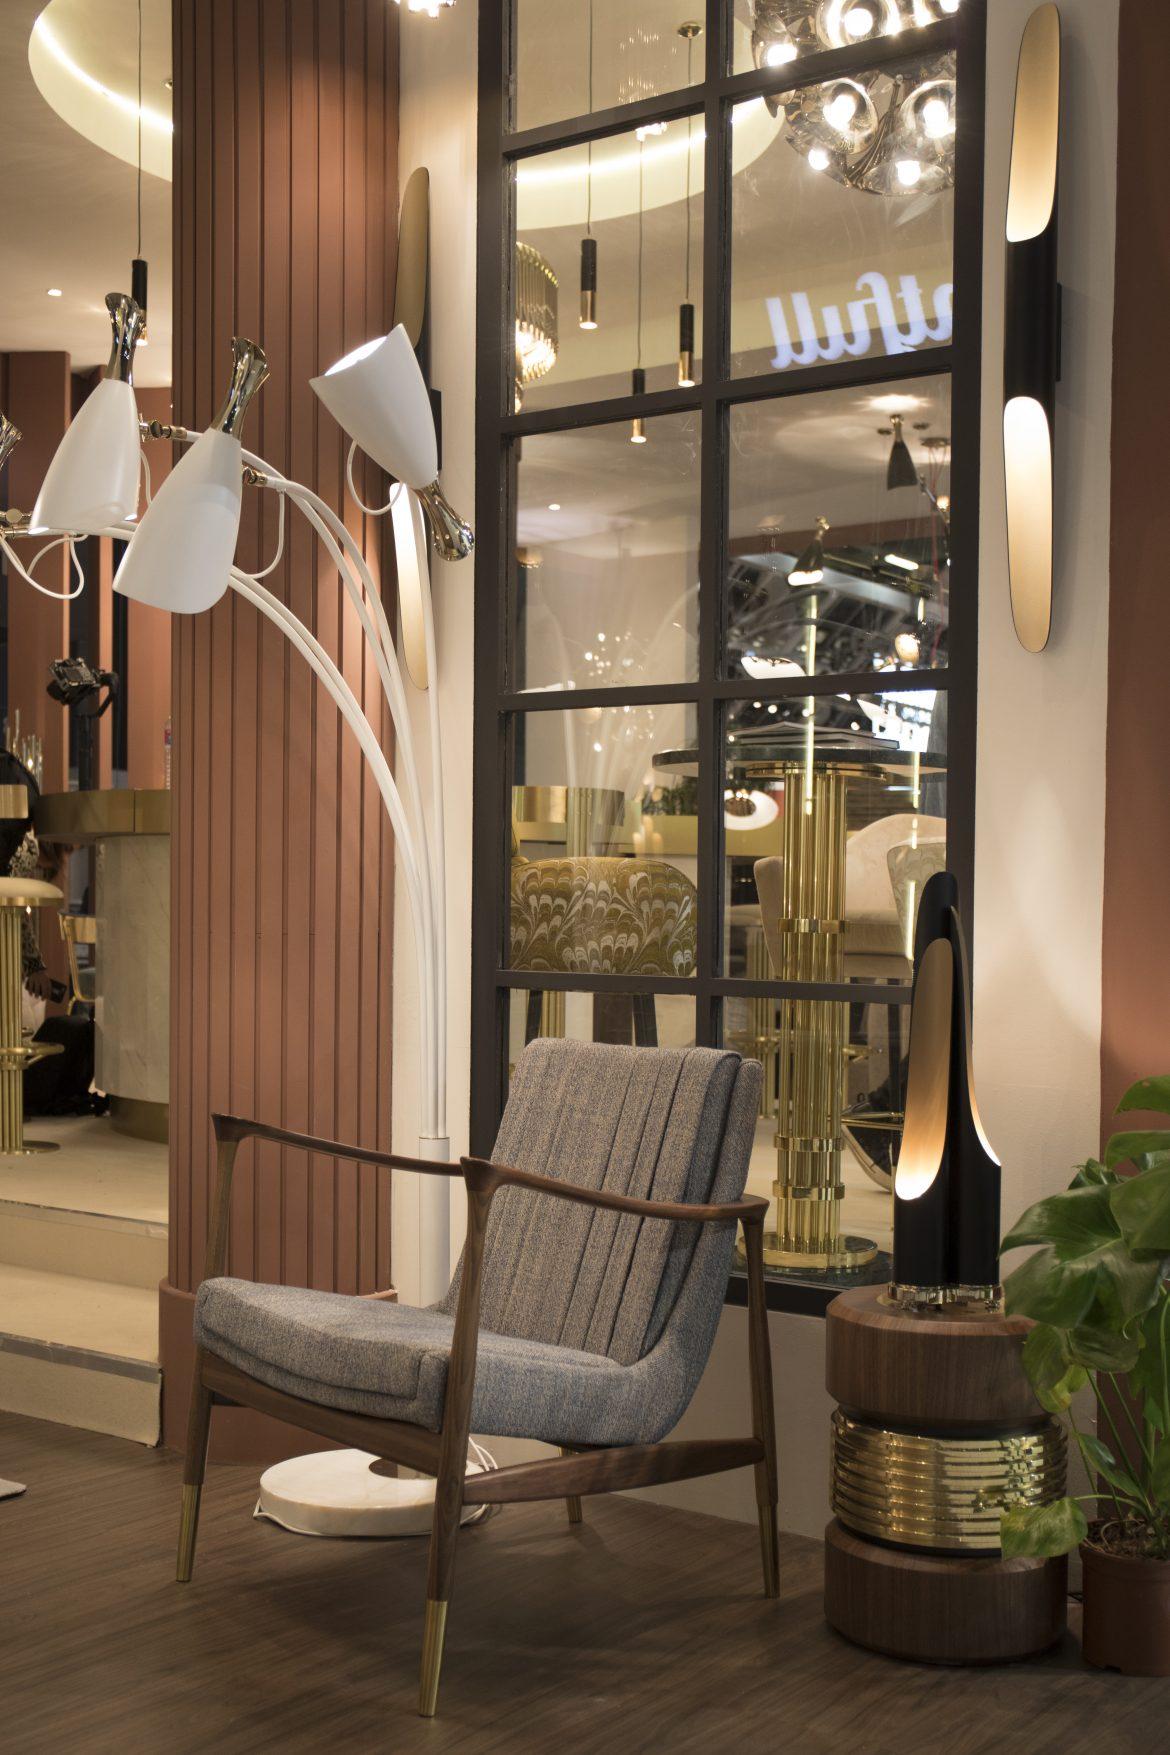 Mid-Century Furniture At Maison Et Objet 2019 mid-century furniture Mid-Century Furniture At Maison Et Objet 2019 Mid Century Furniture At Maison Et Objet 2019 5